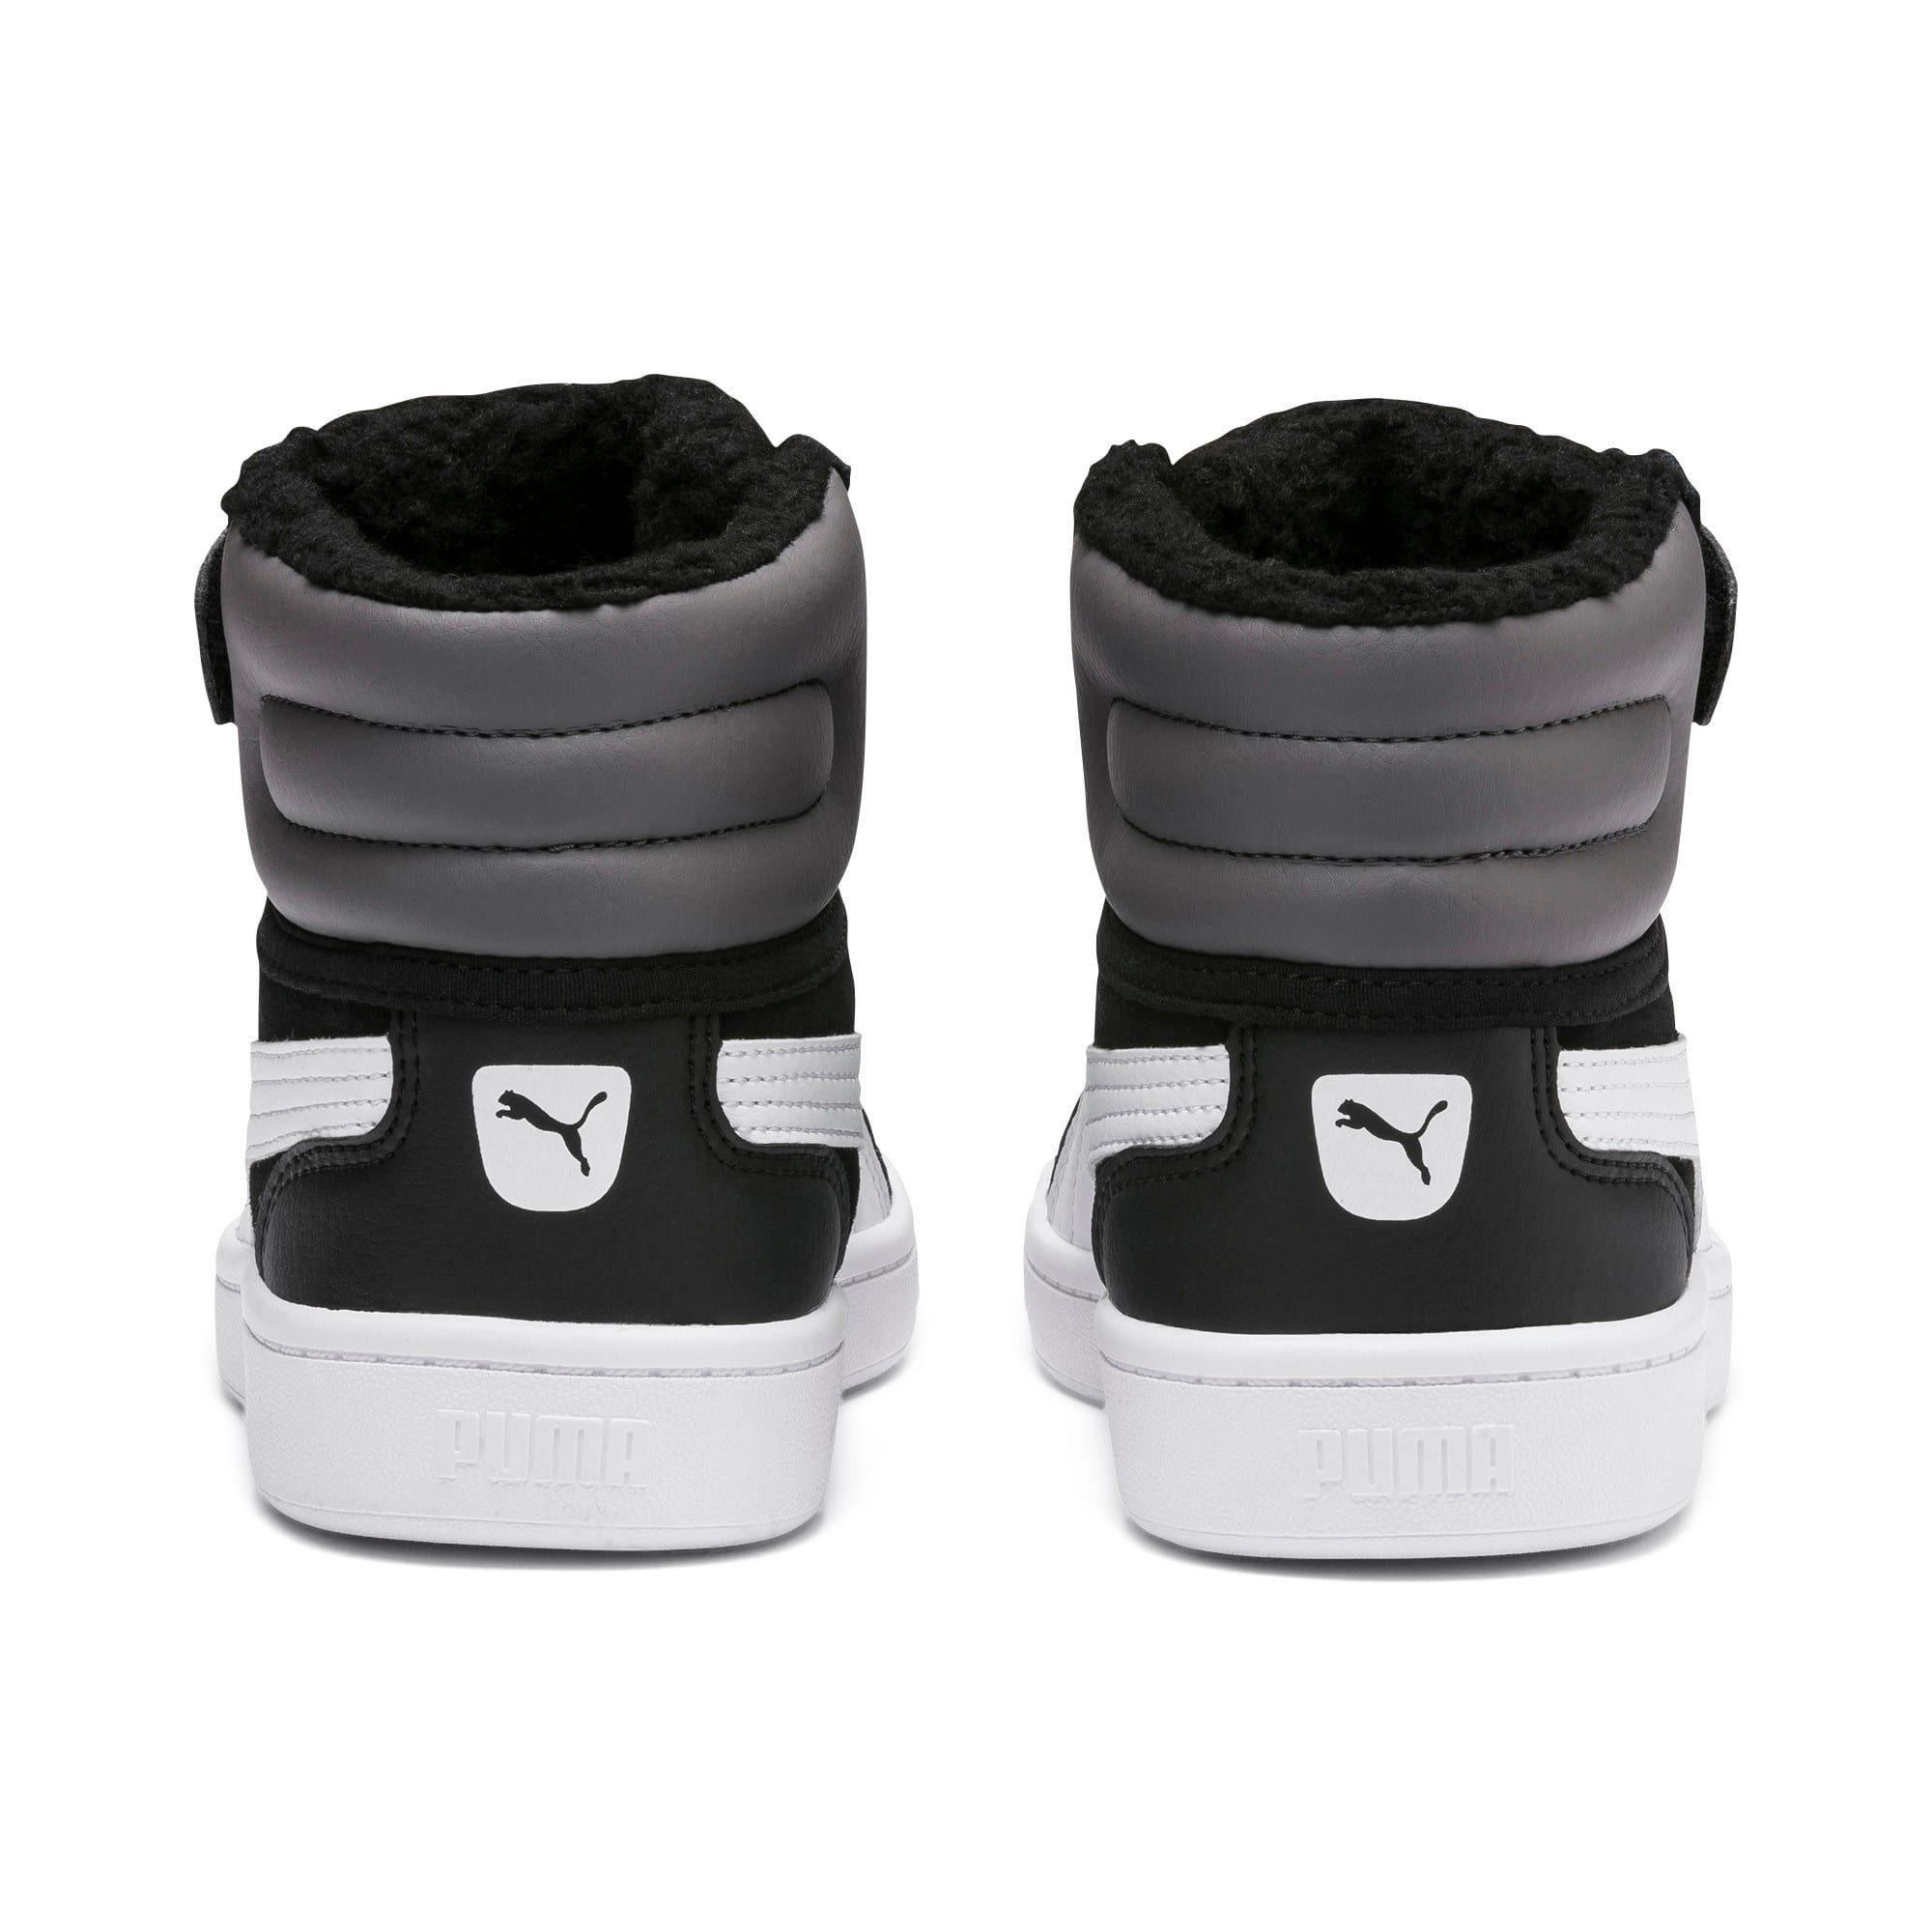 Basket Vikky v2 Mid Fur V Kids | Sneakers fashion, Elastic ...